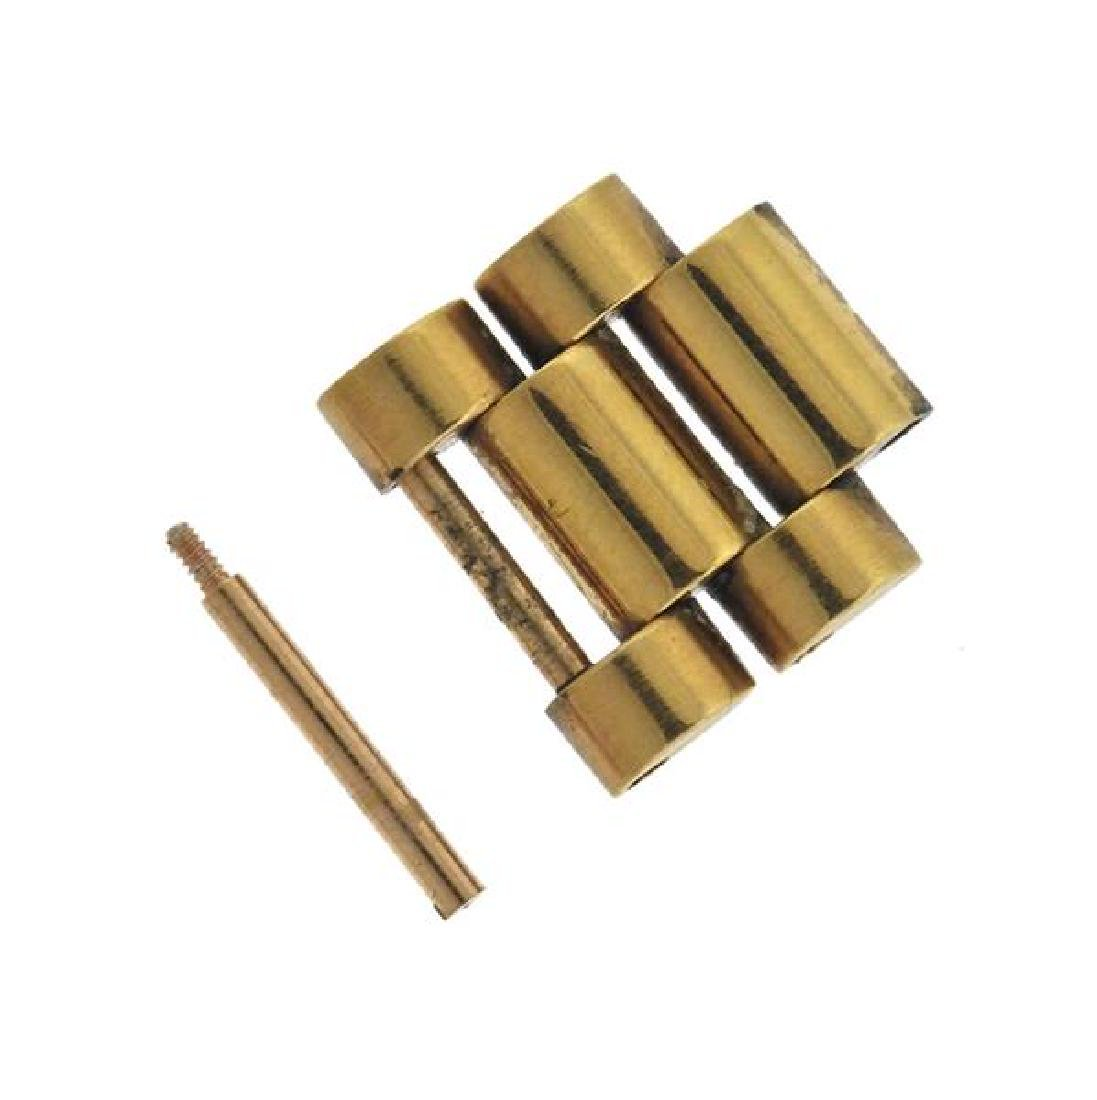 Rolex 18k Gold Link Pin Lot